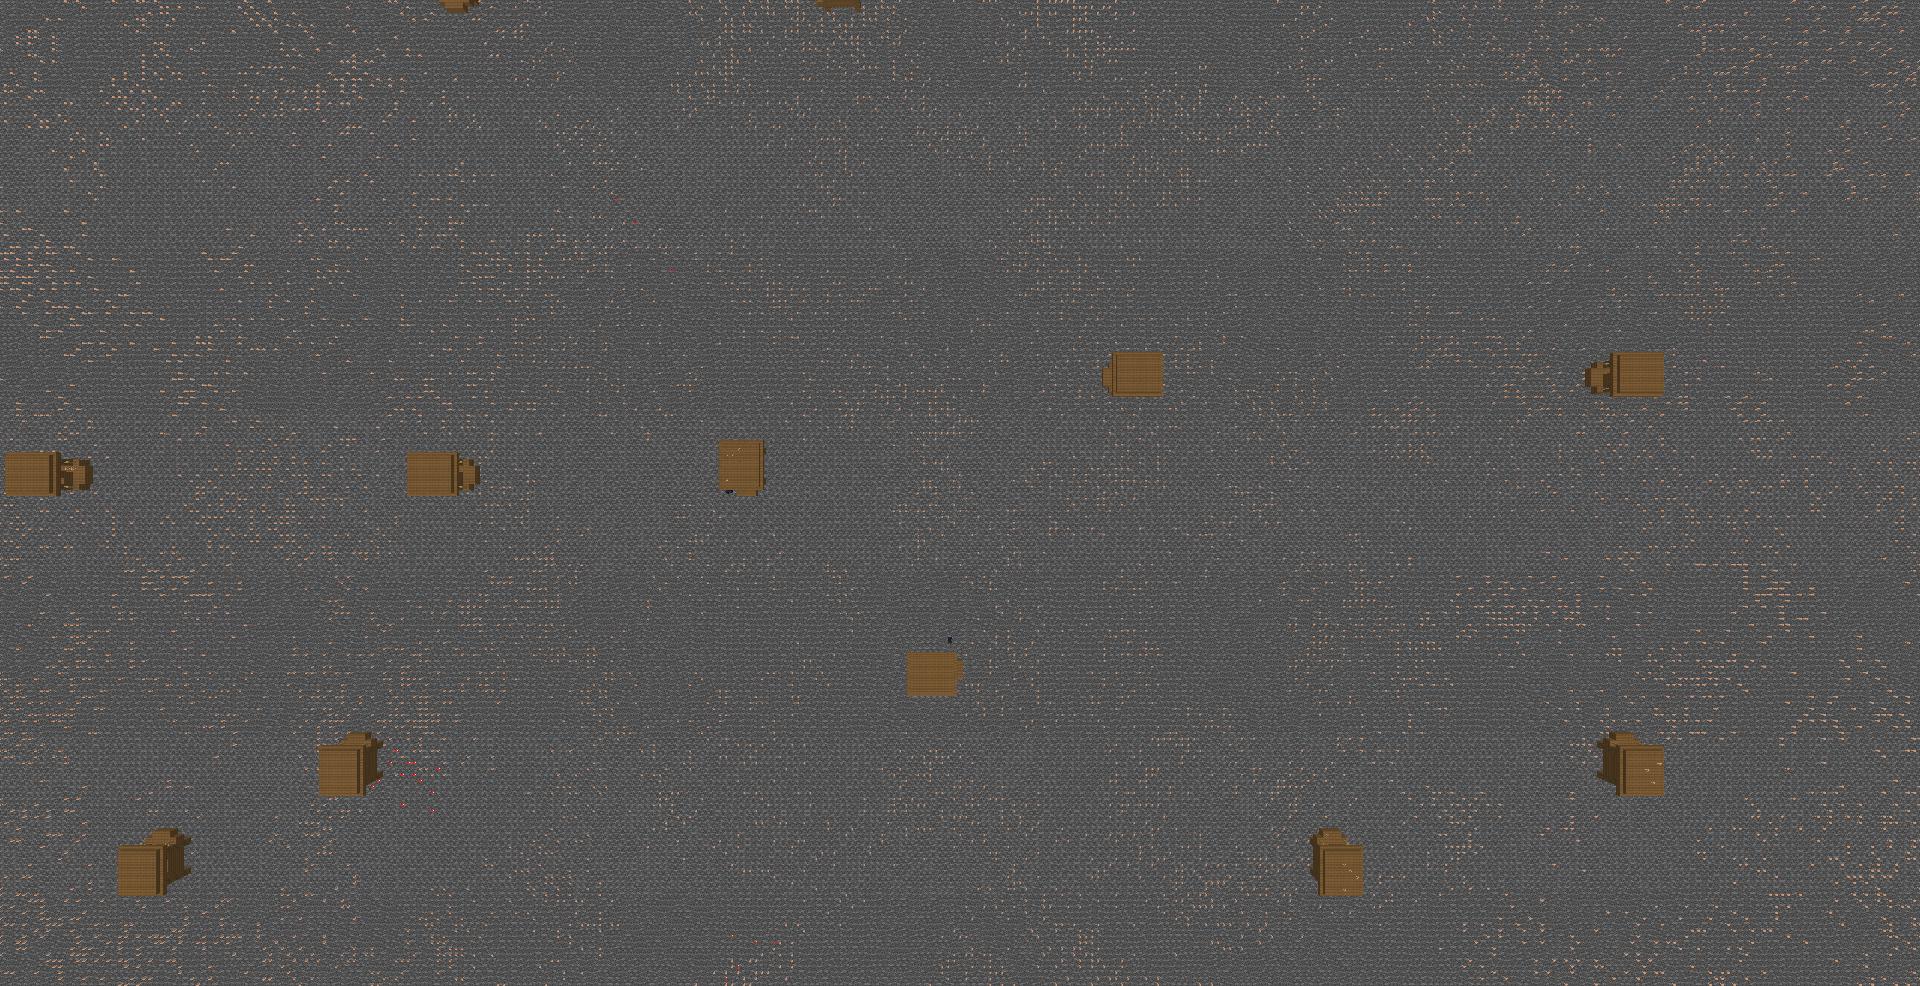 separation_1_spacing_4